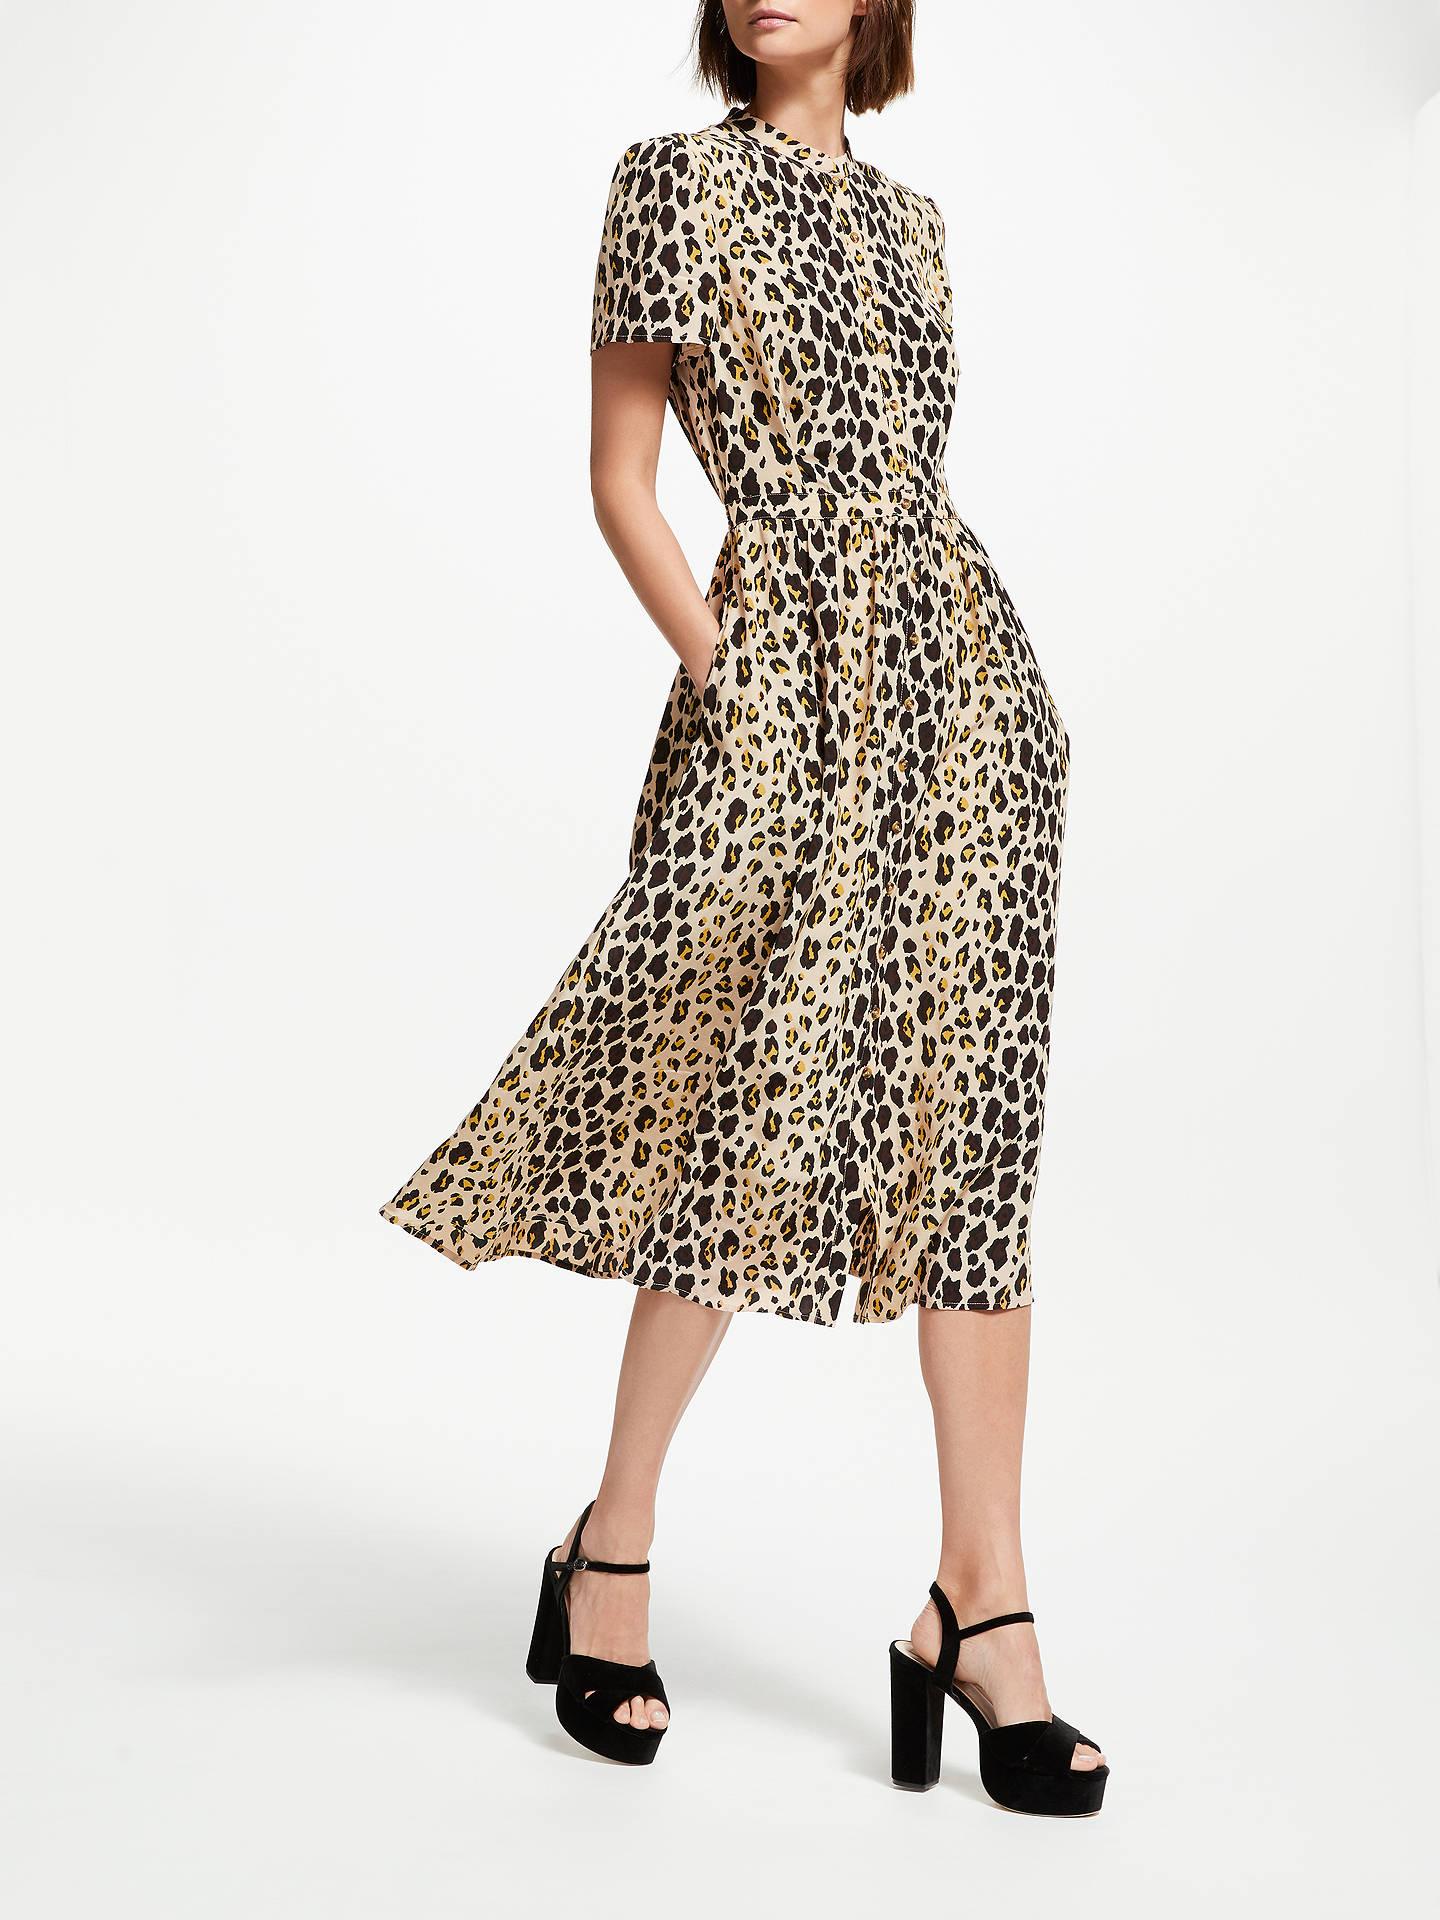 BuySomerset by Alice Temperley Leopard Print Shirt Dress 3b3ff0291